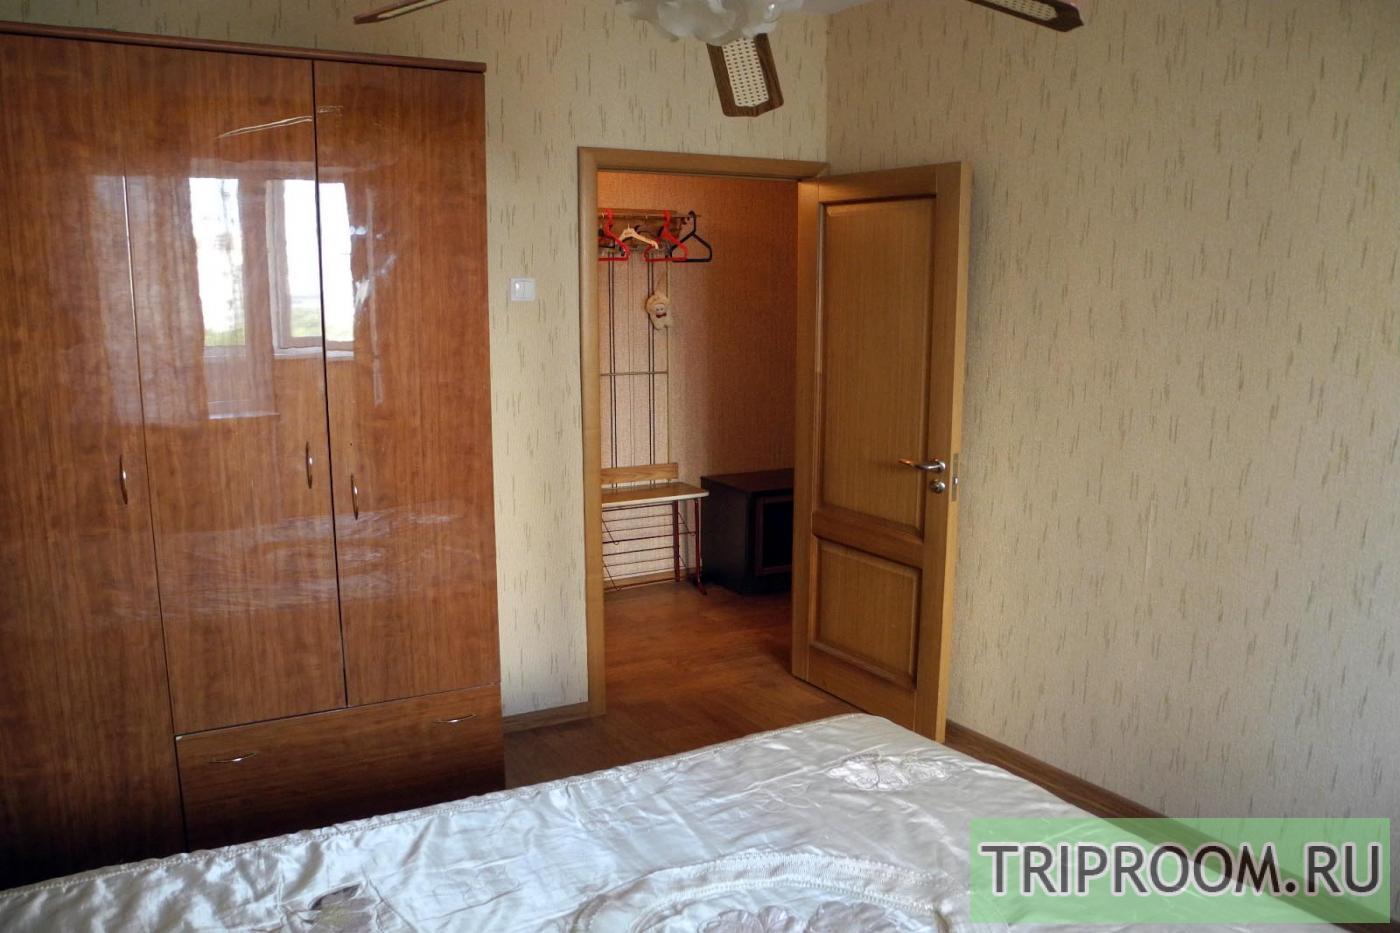 2-комнатная квартира посуточно (вариант № 3868), ул. Кропоткина улица, фото № 7